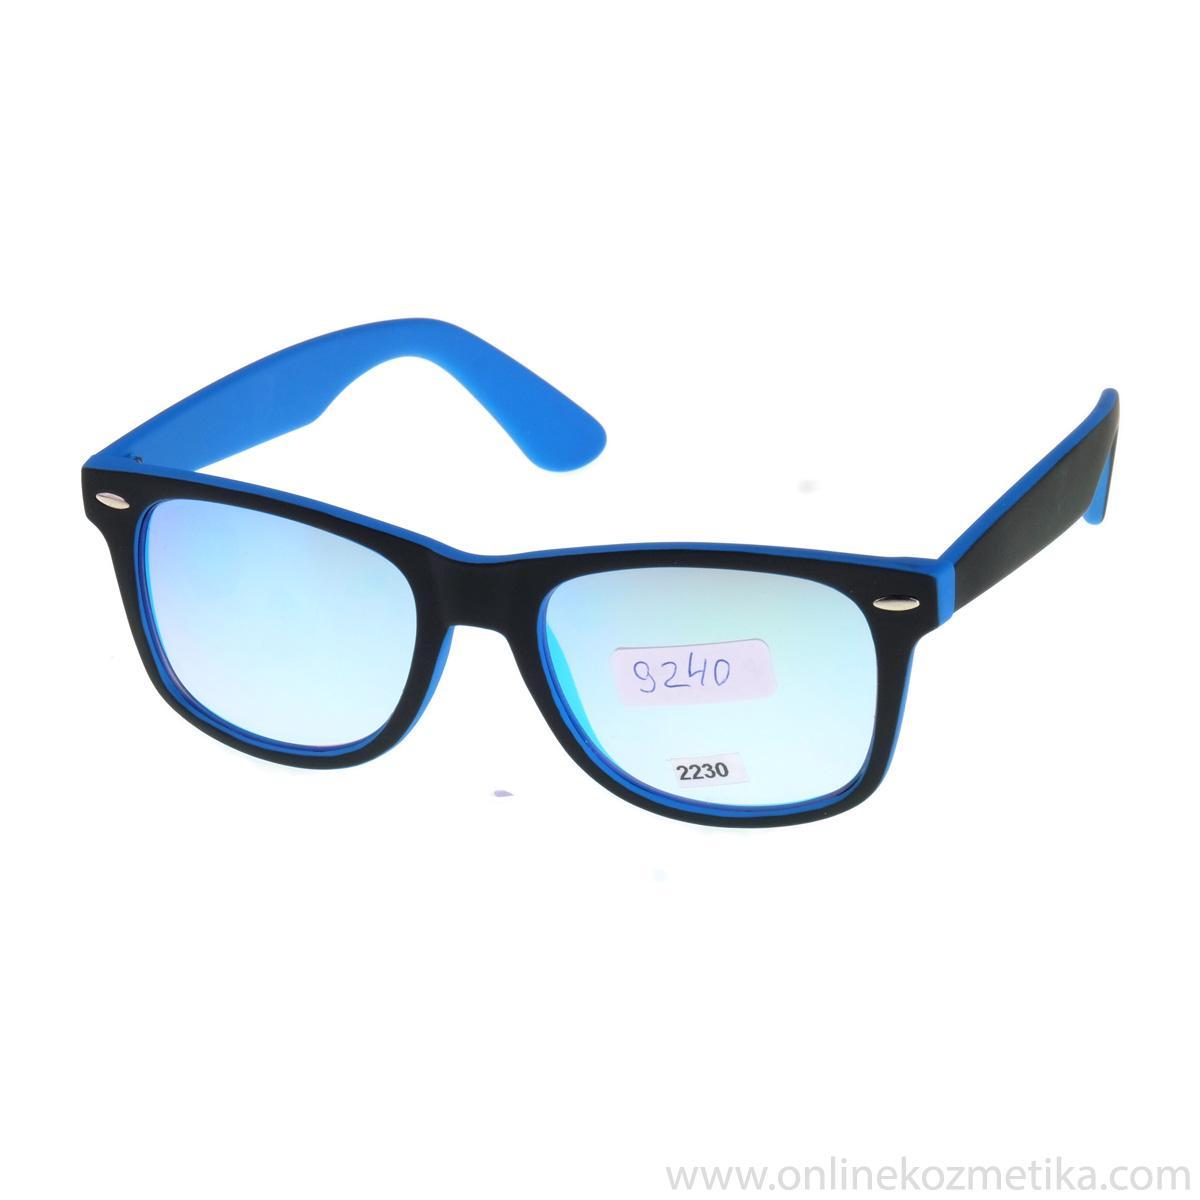 NAOČARE SUN BLUE LINE AZ 9240